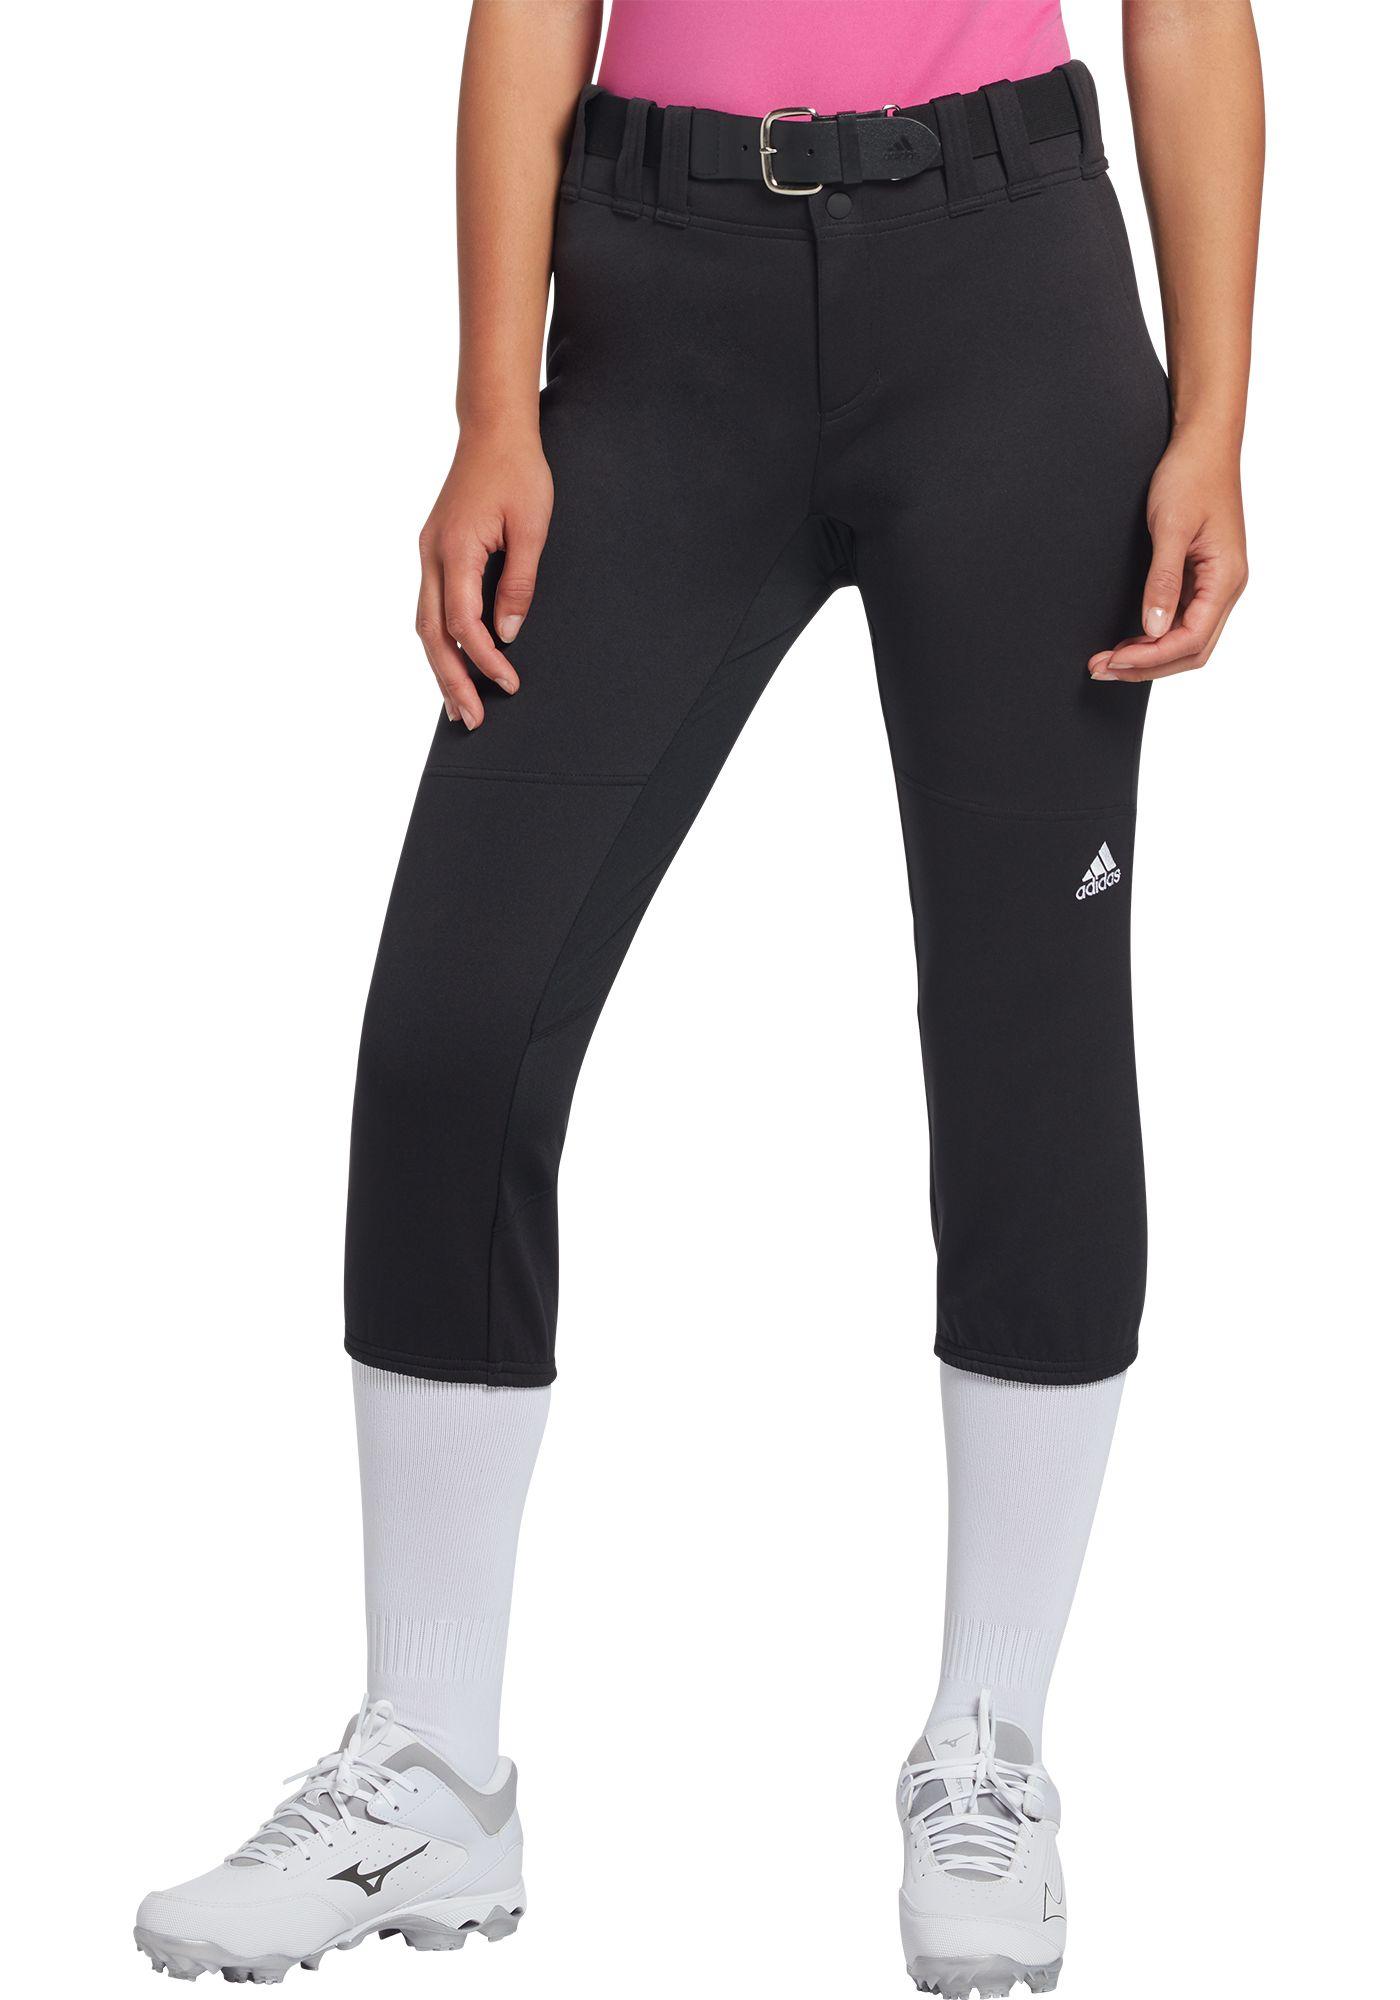 adidas Women's Elevated Softball Pants